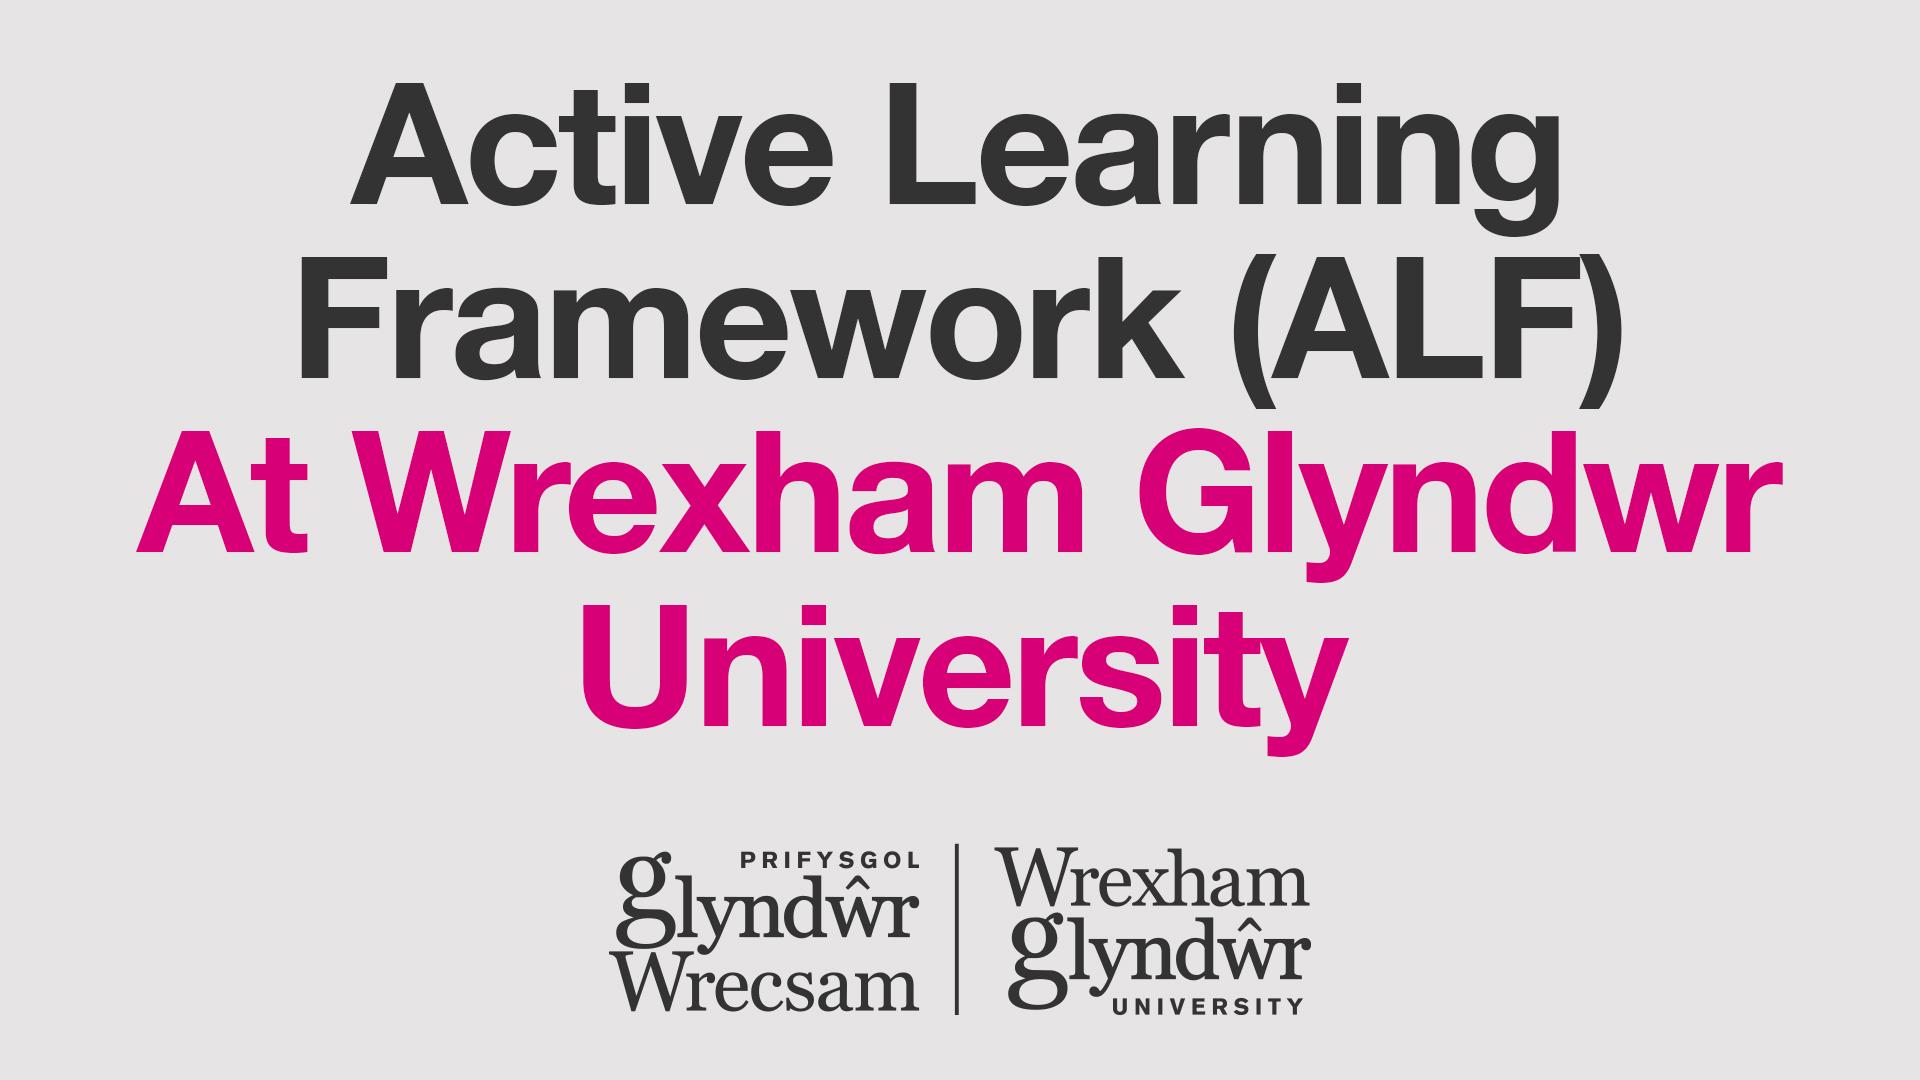 Active Learning Framework video